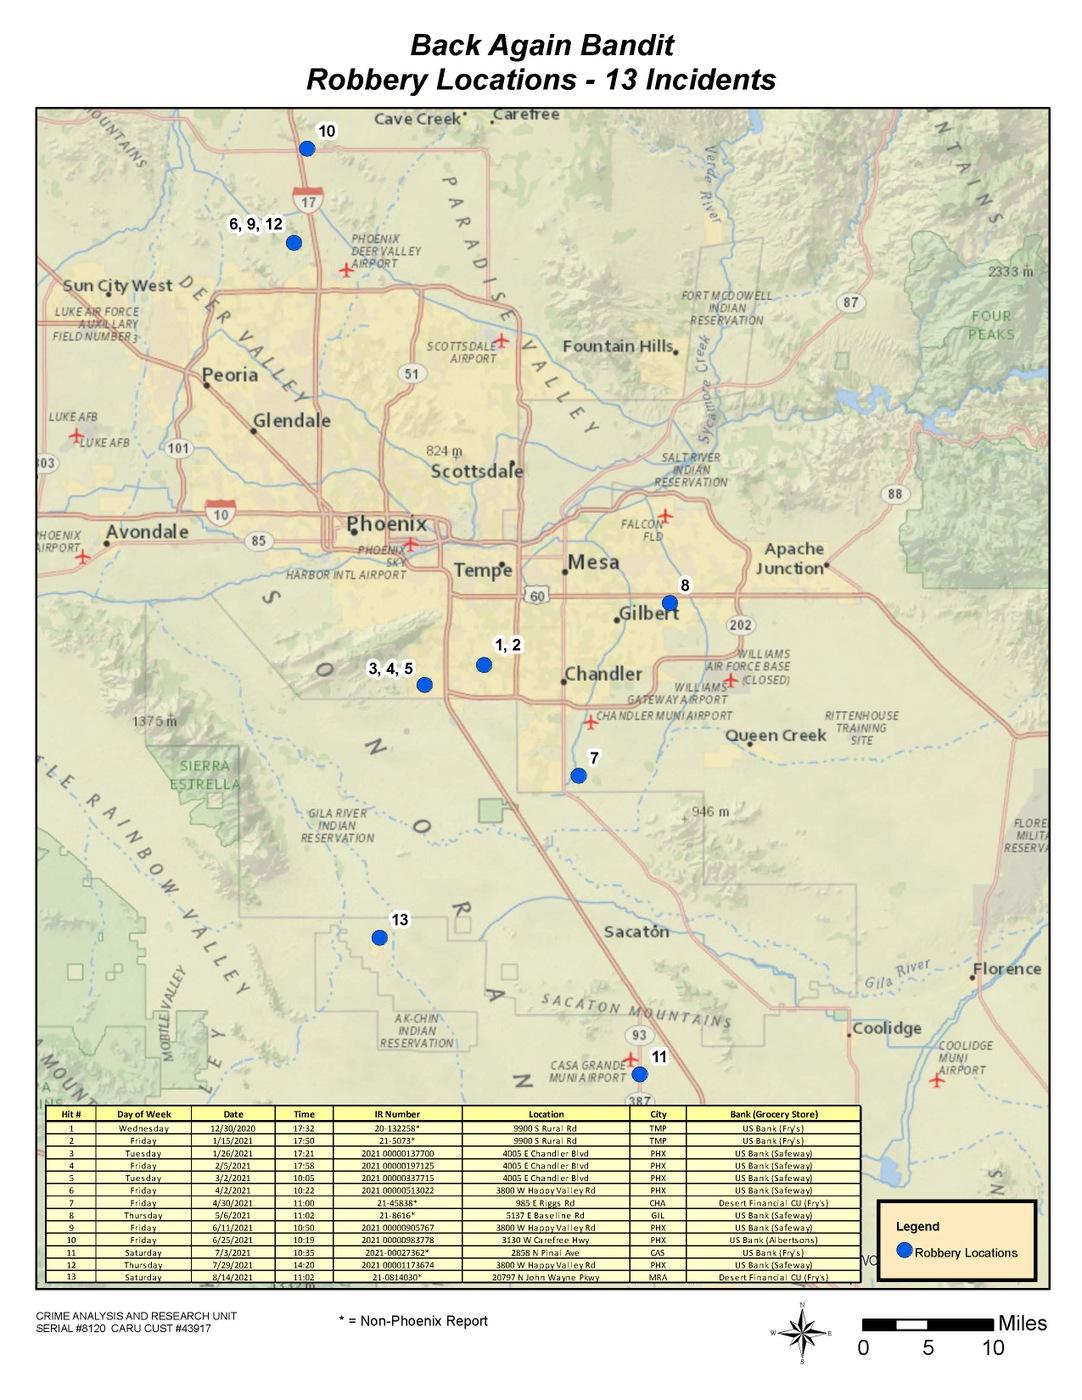 Back Again Bandit Map